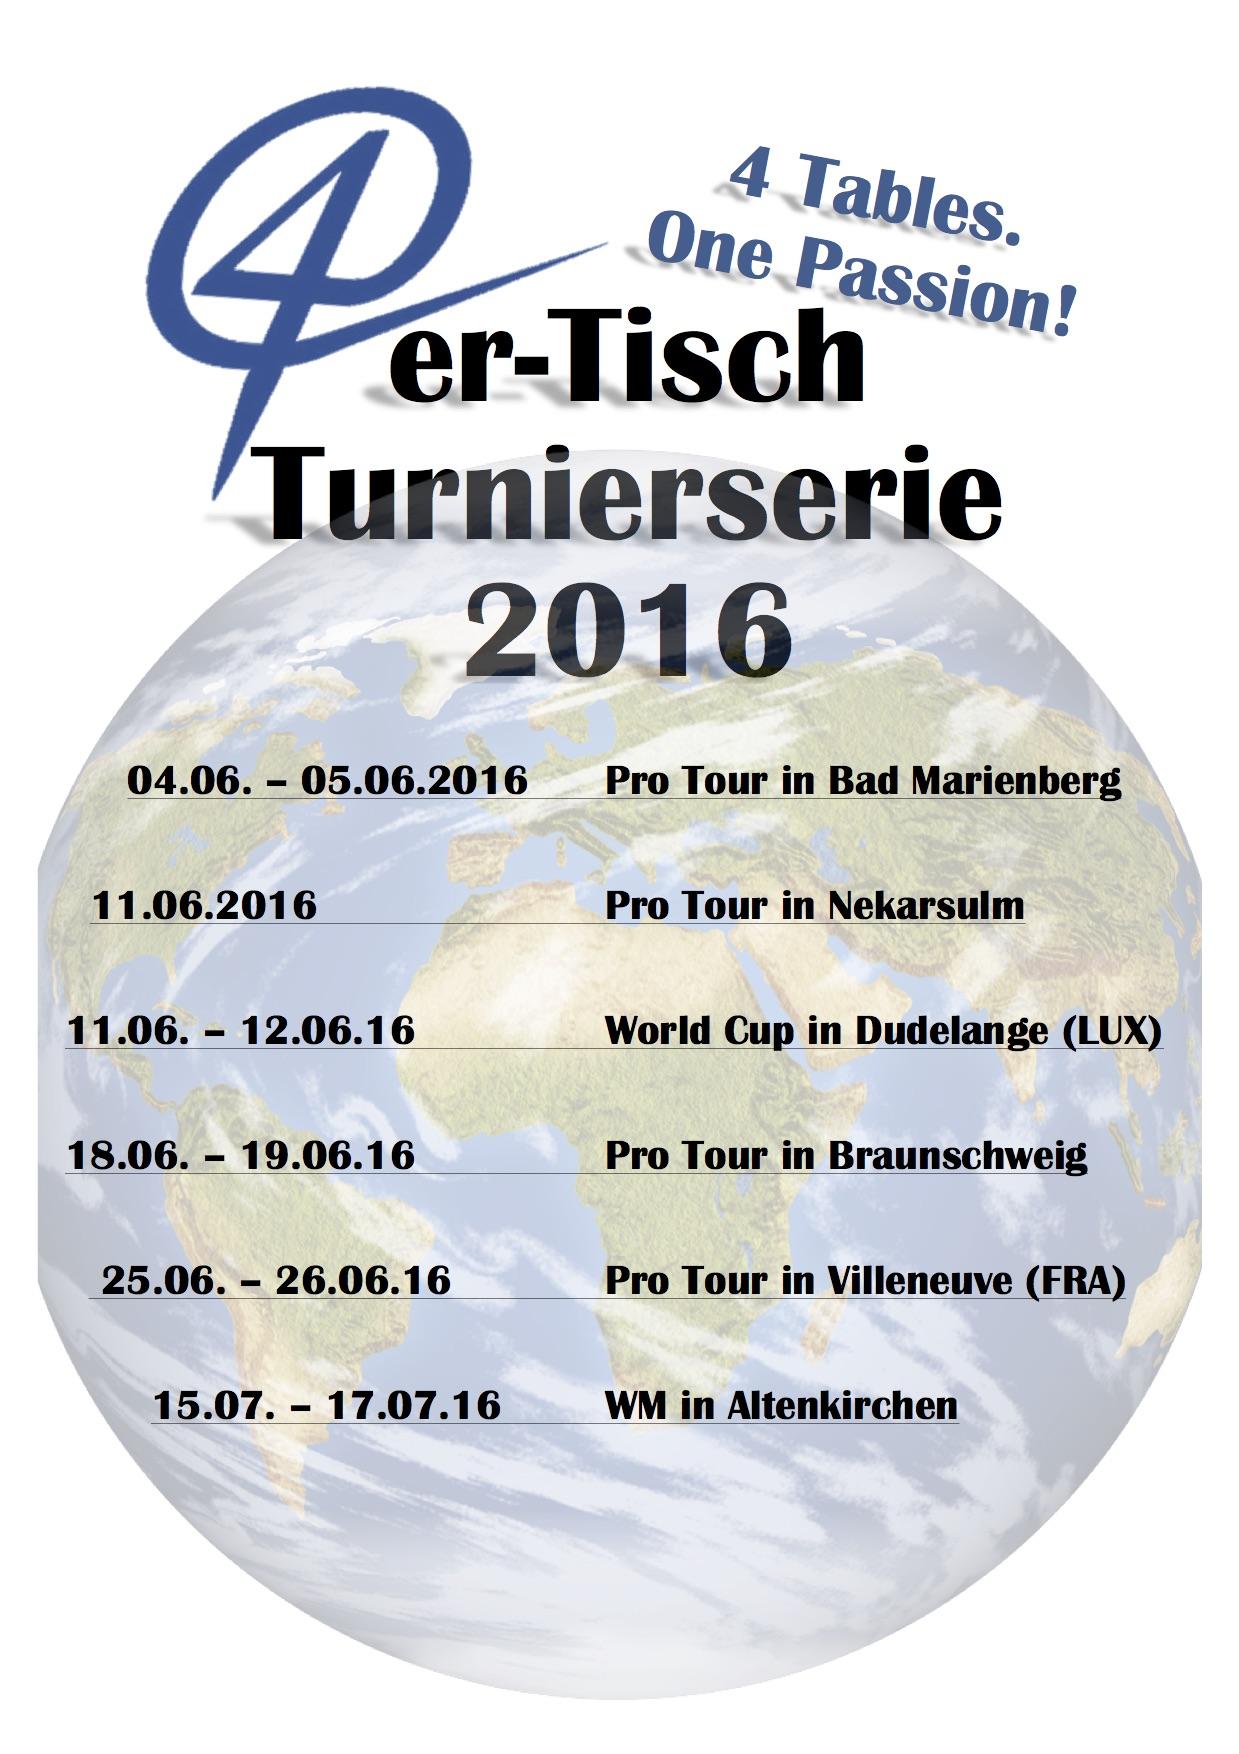 Turnierserie 2016